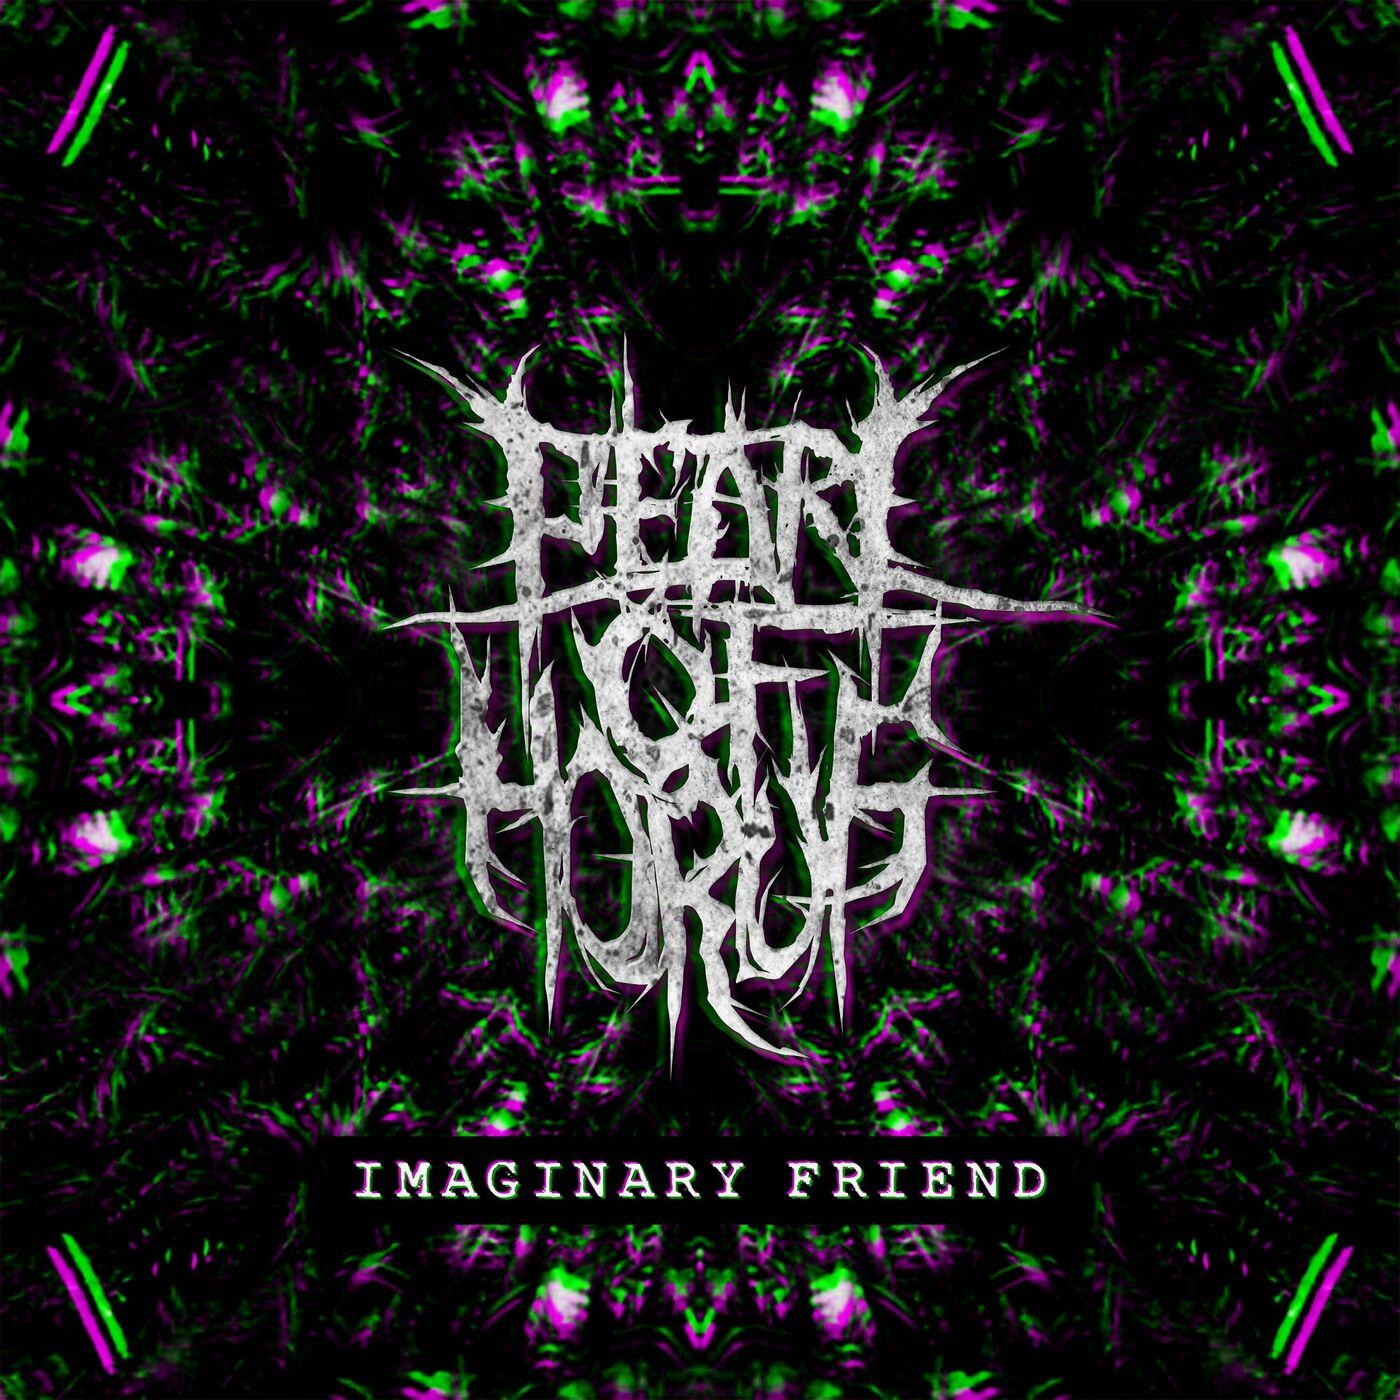 Pearl Of Horus - Imaginary Friend [single] (2021)